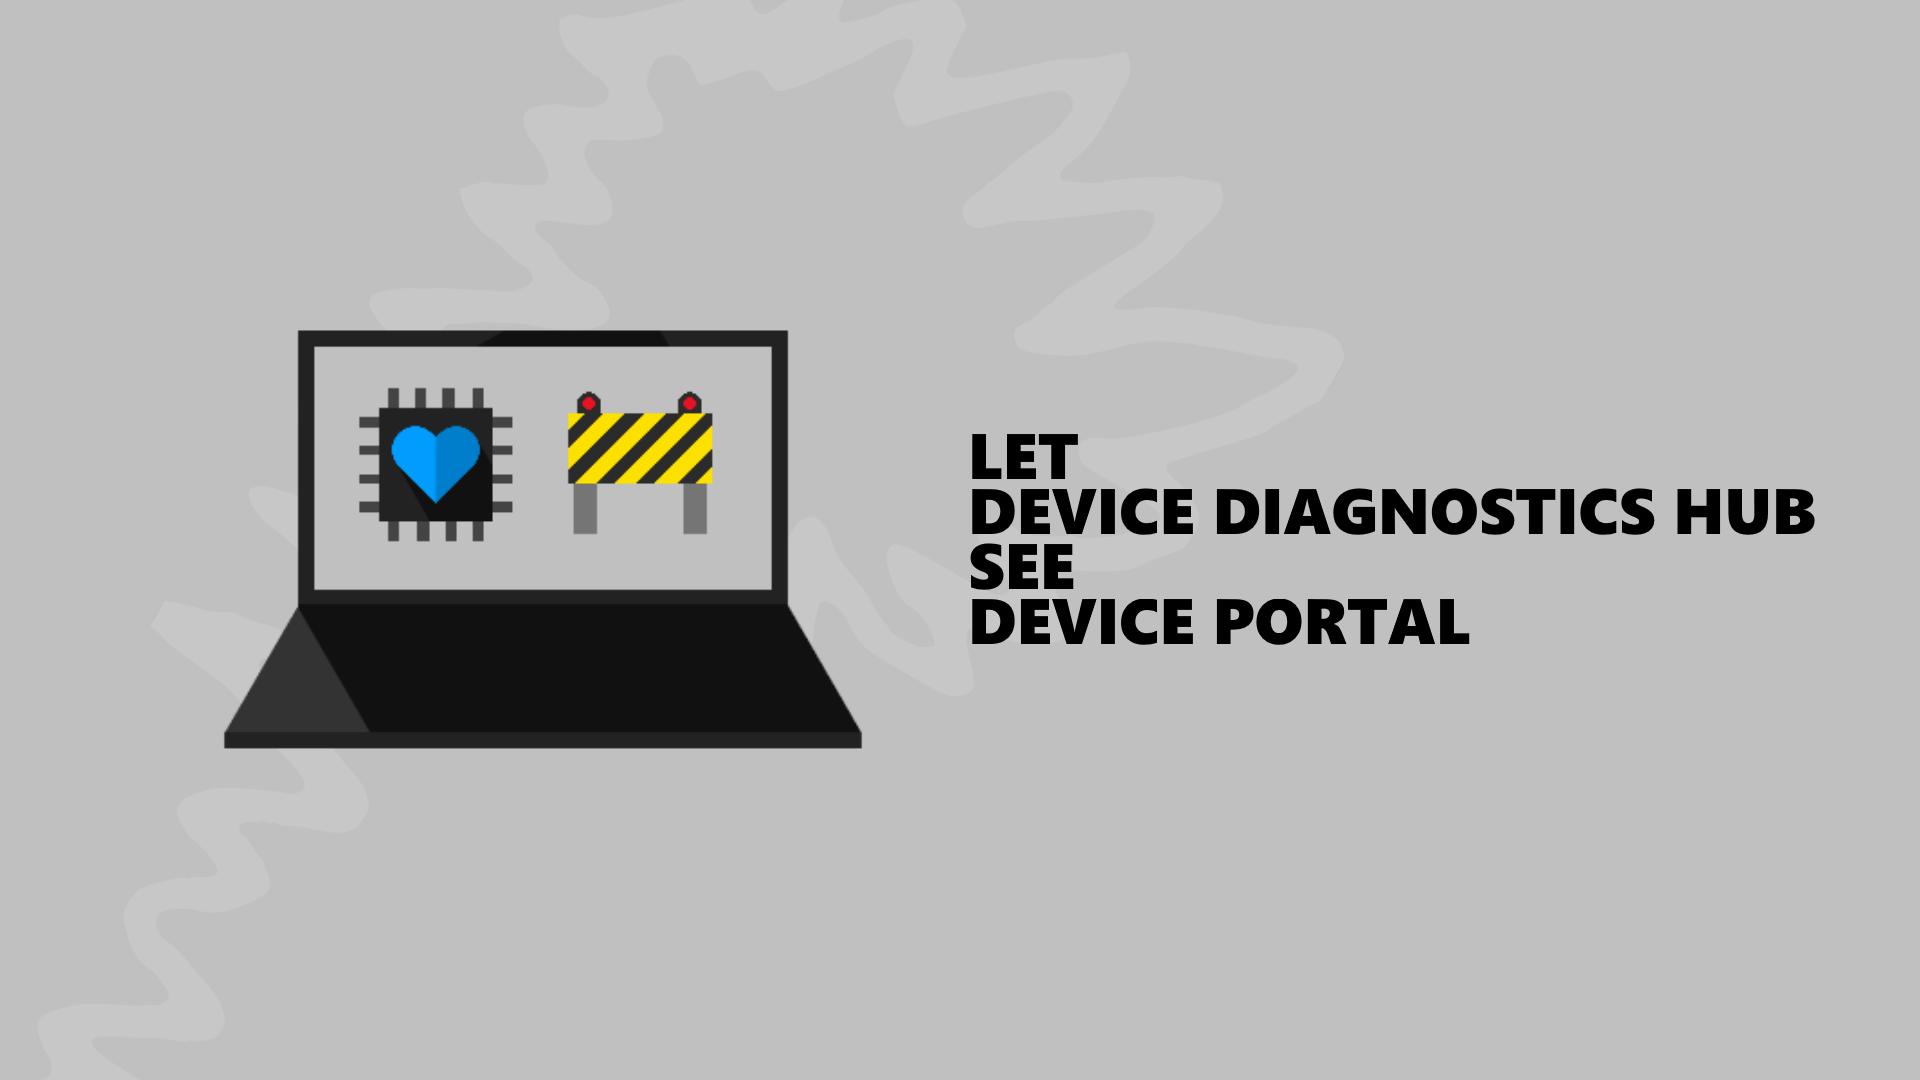 Let Device Diagnostics HUB see Device Portal